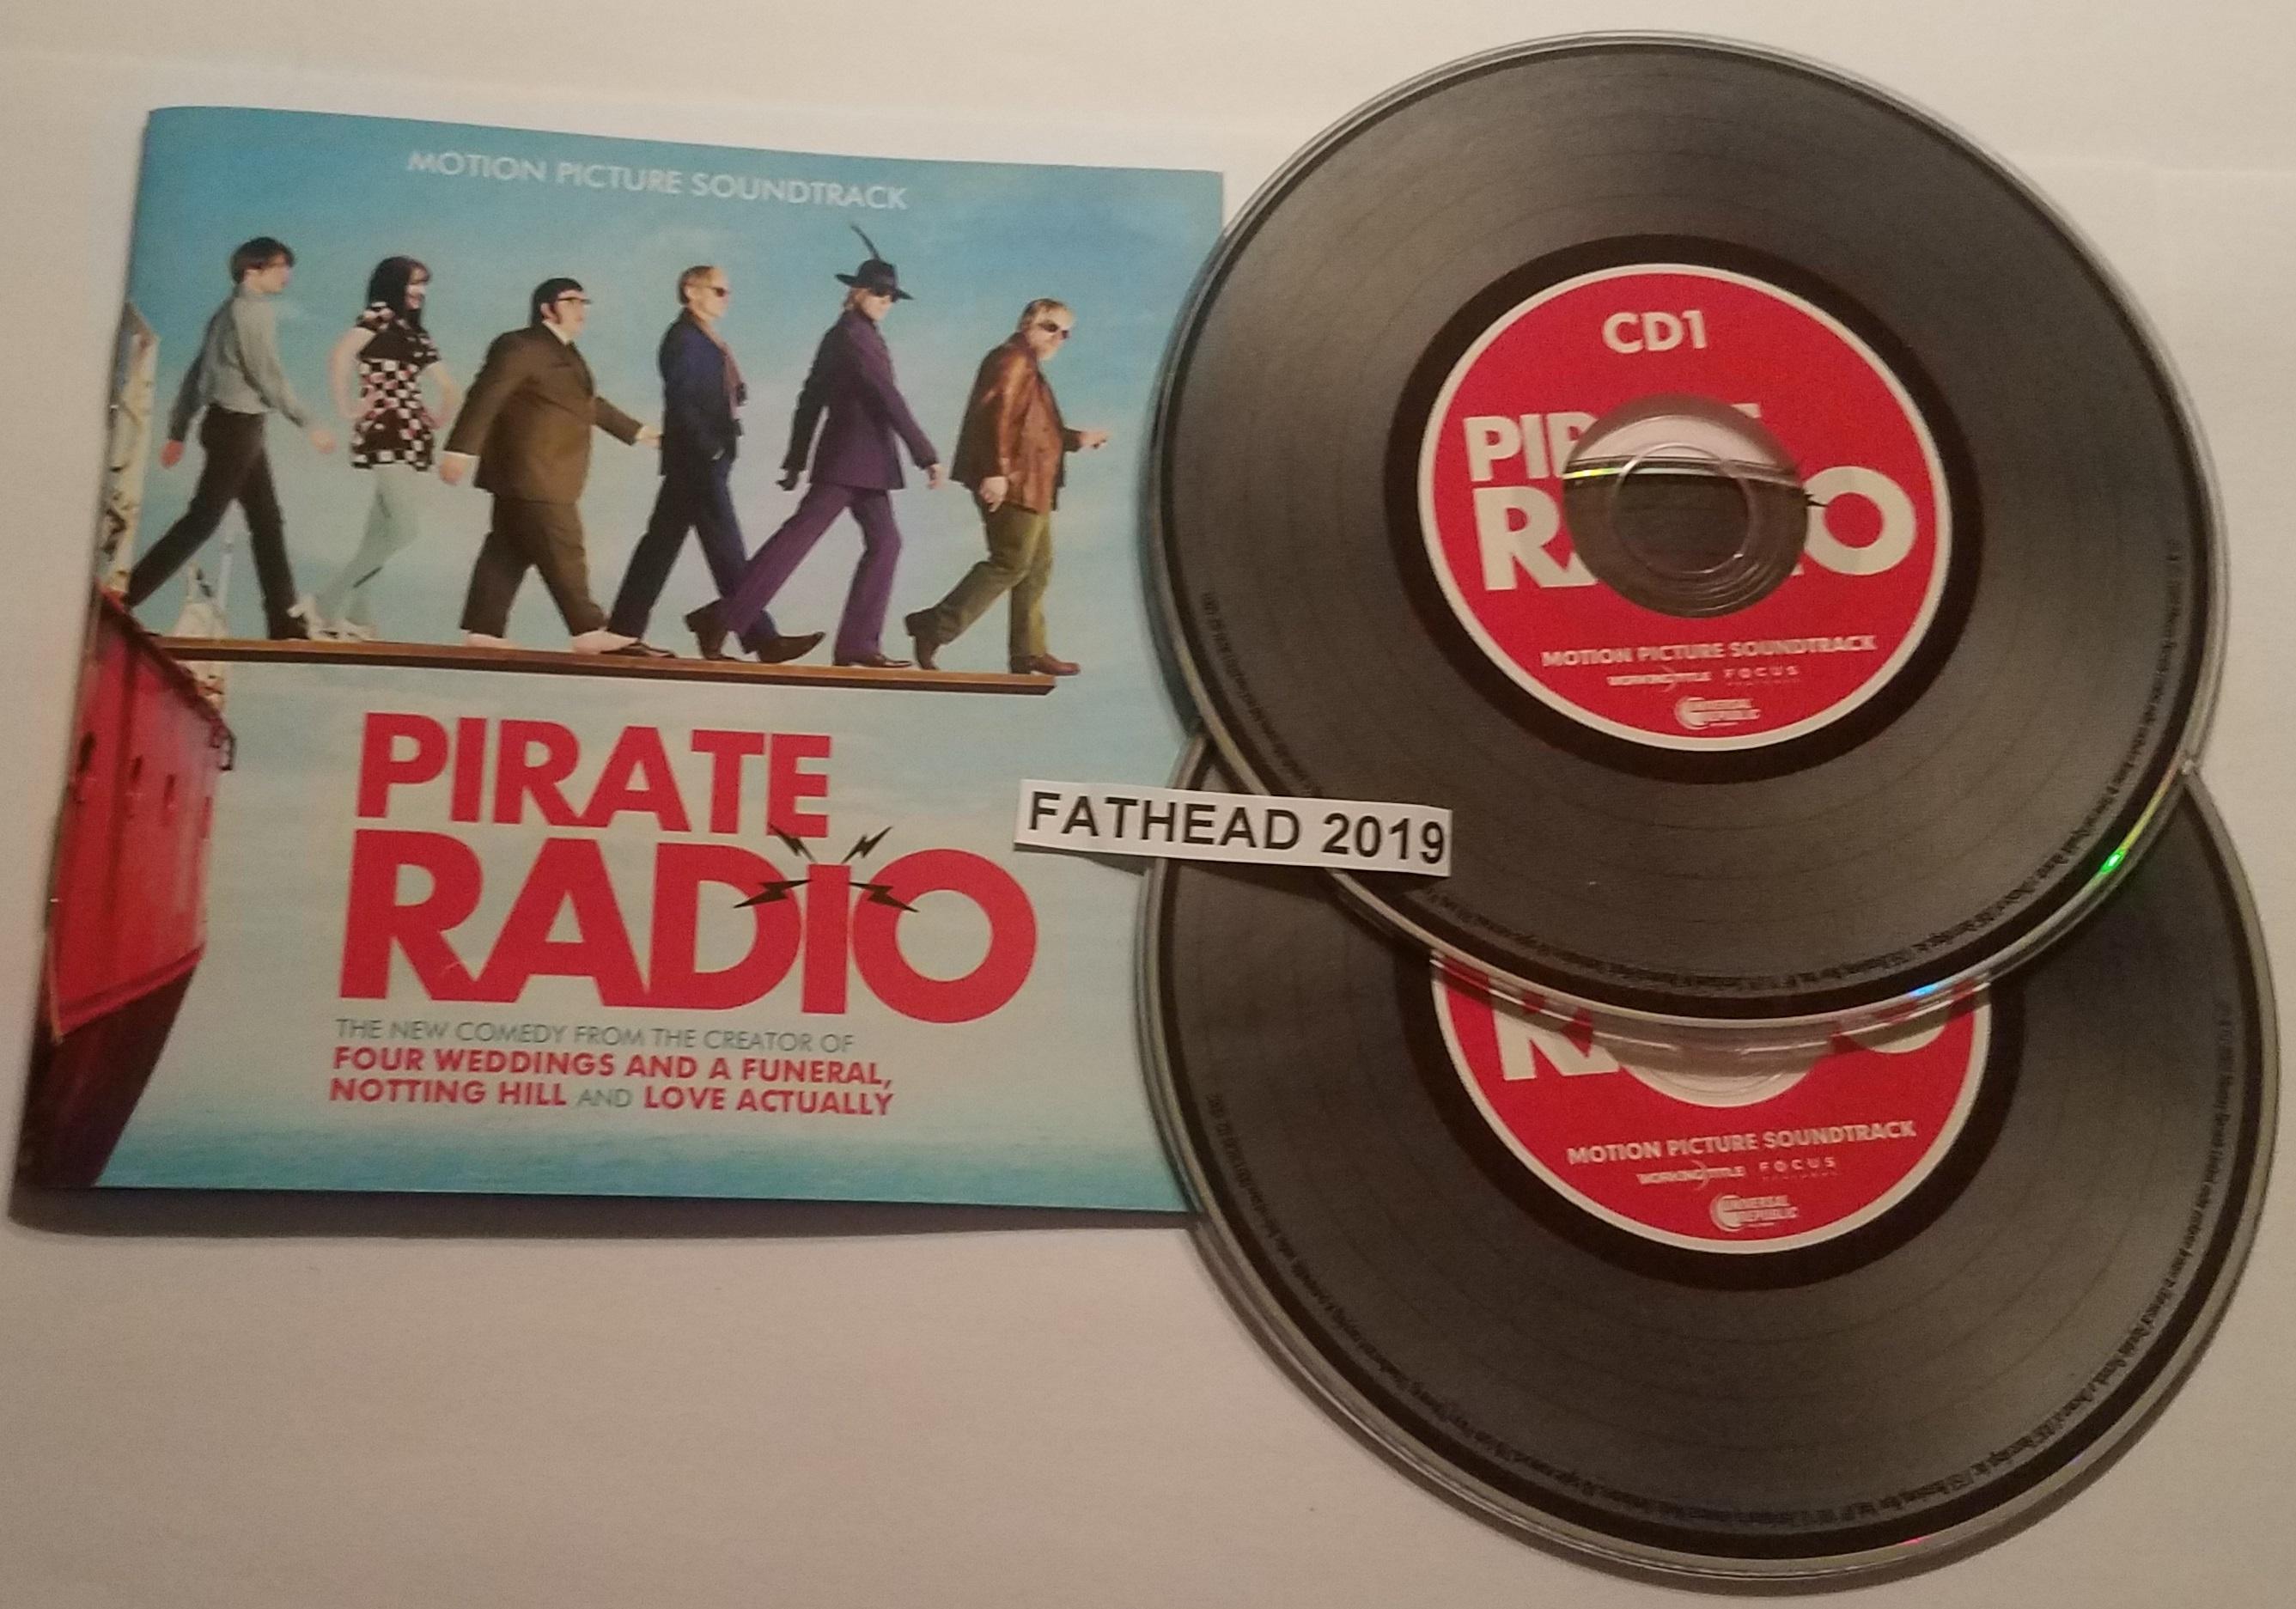 VA - Pirate Radio-OST-2CD-FLAC-2009-FATHEAD | DOWNLOAD Free Music